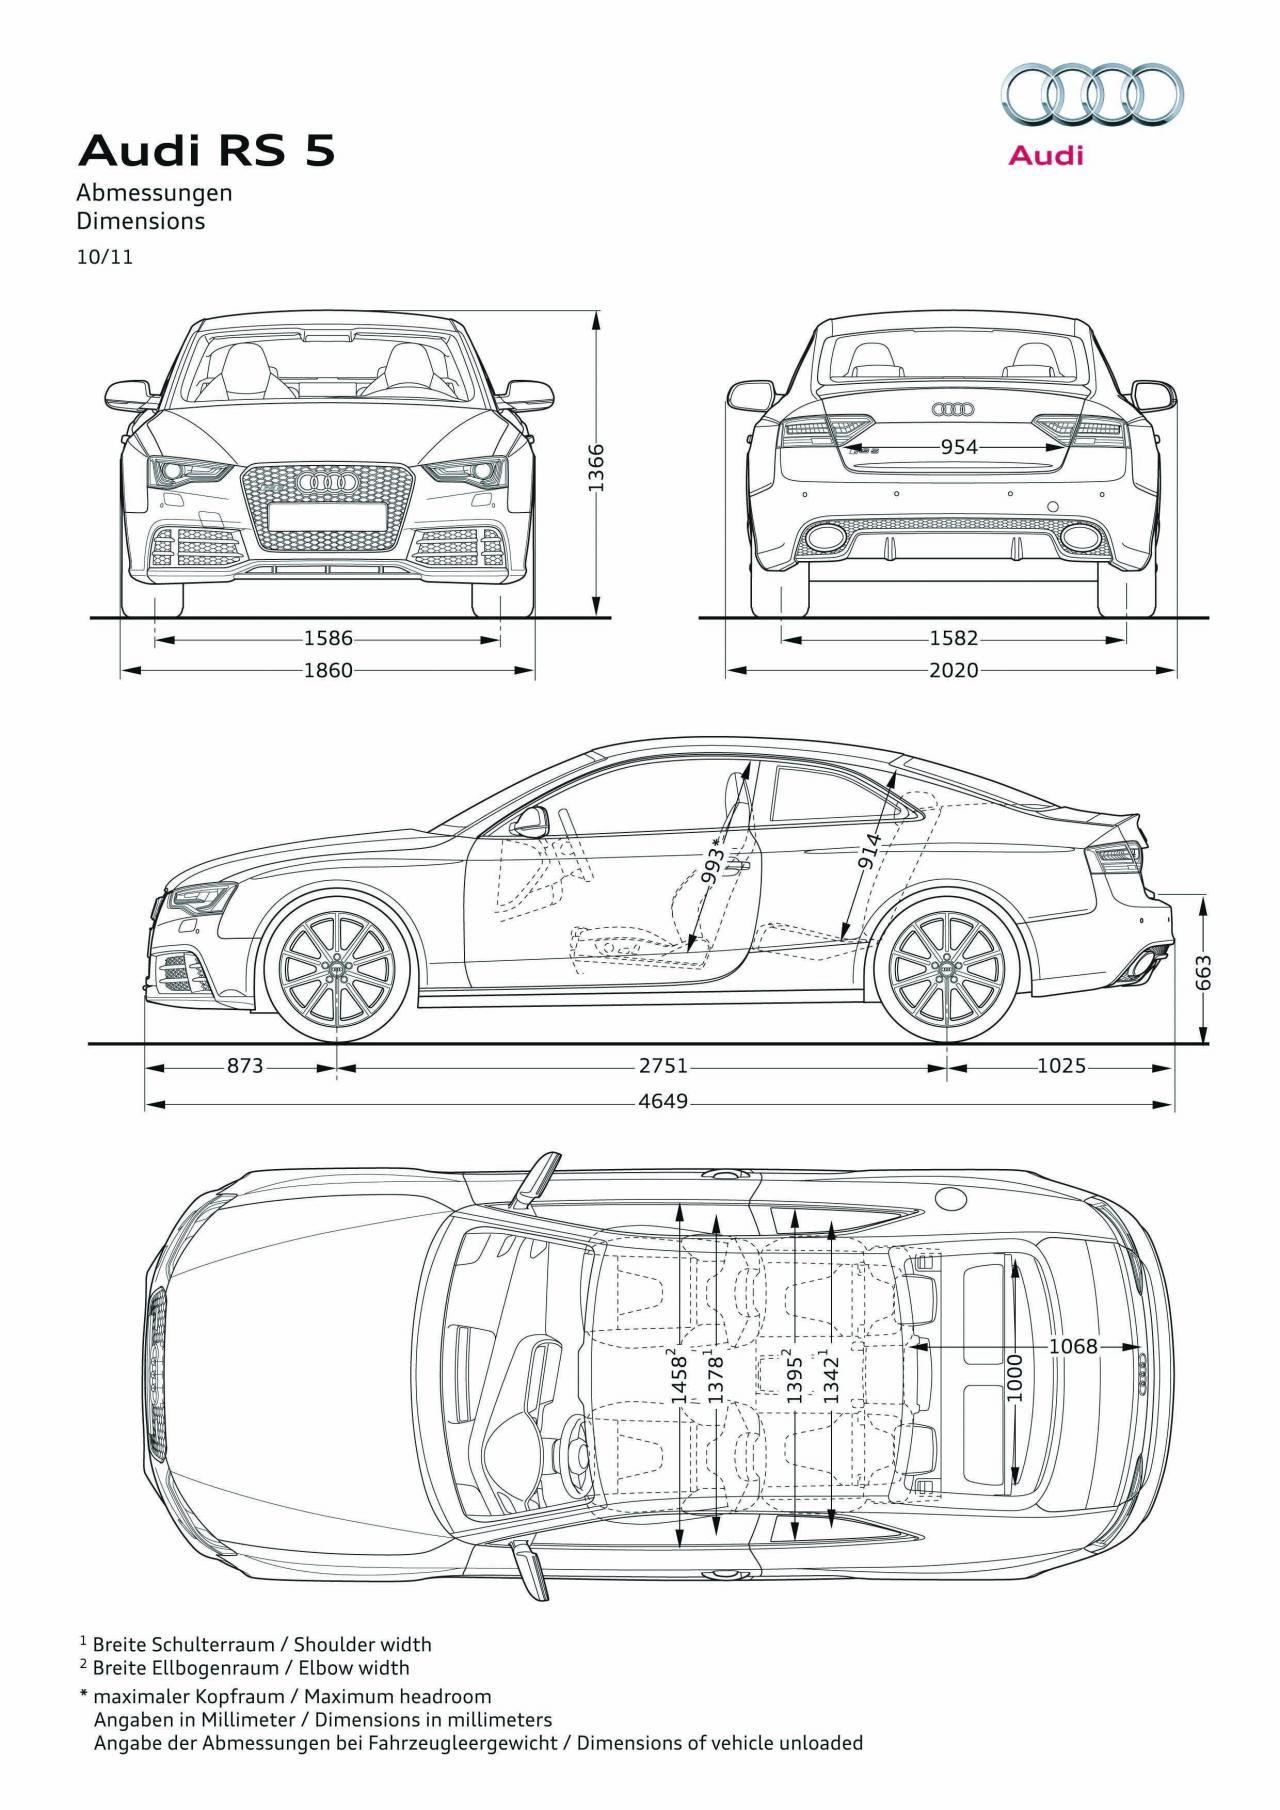 2012 Audi Rs5 Audi A1 Audi R8 Spyder Audi Tt